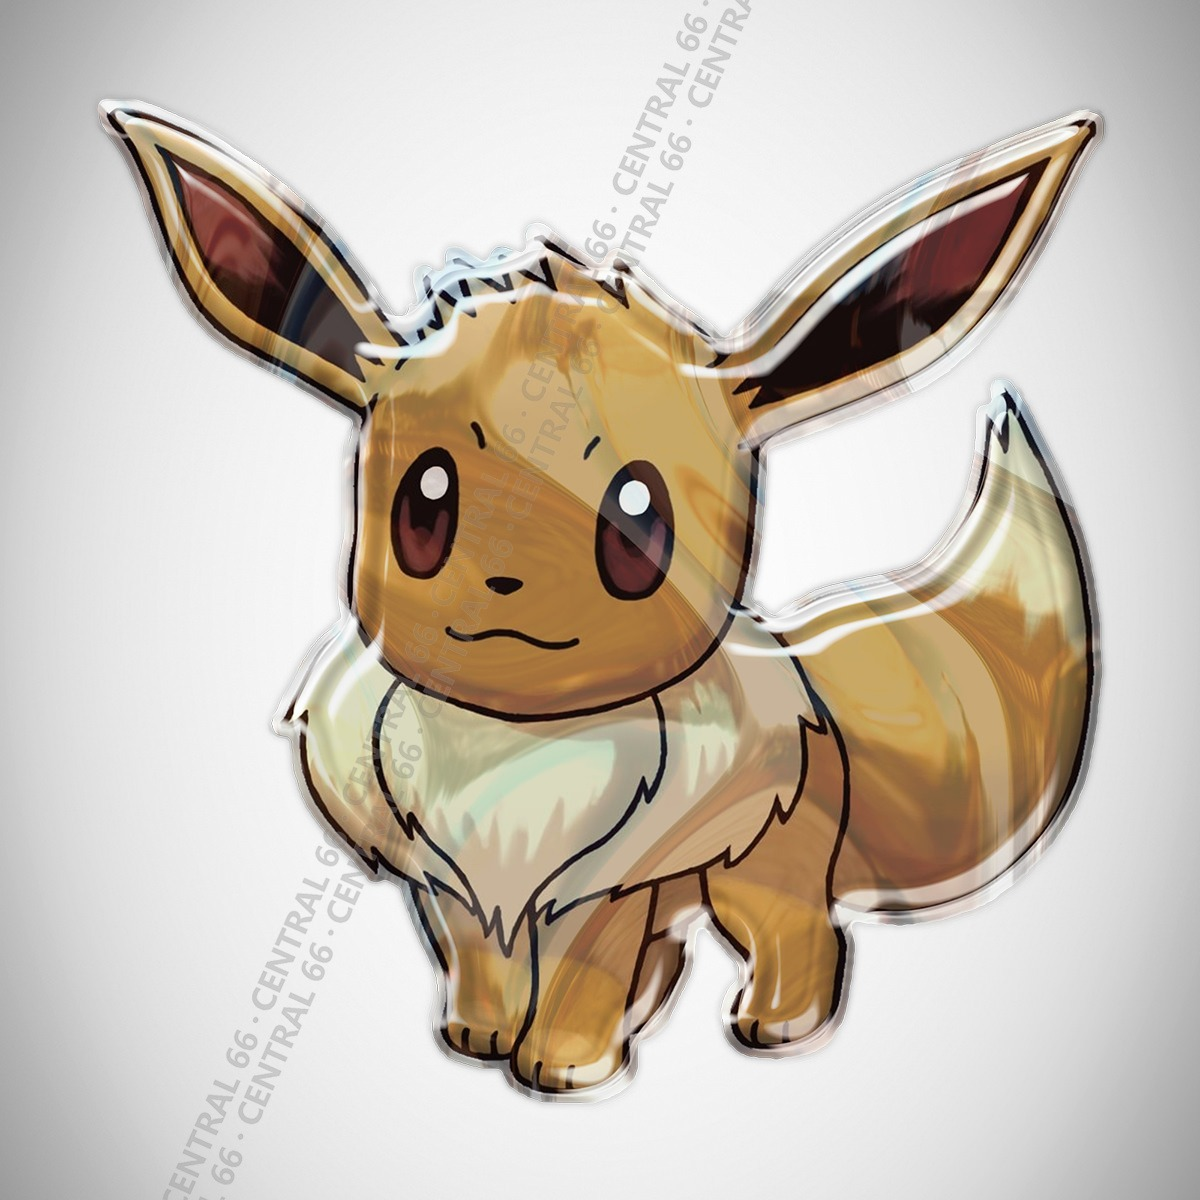 Adesivo Desenho Pokemon Eevee Resinado R 29 90 Em Mercado Livre